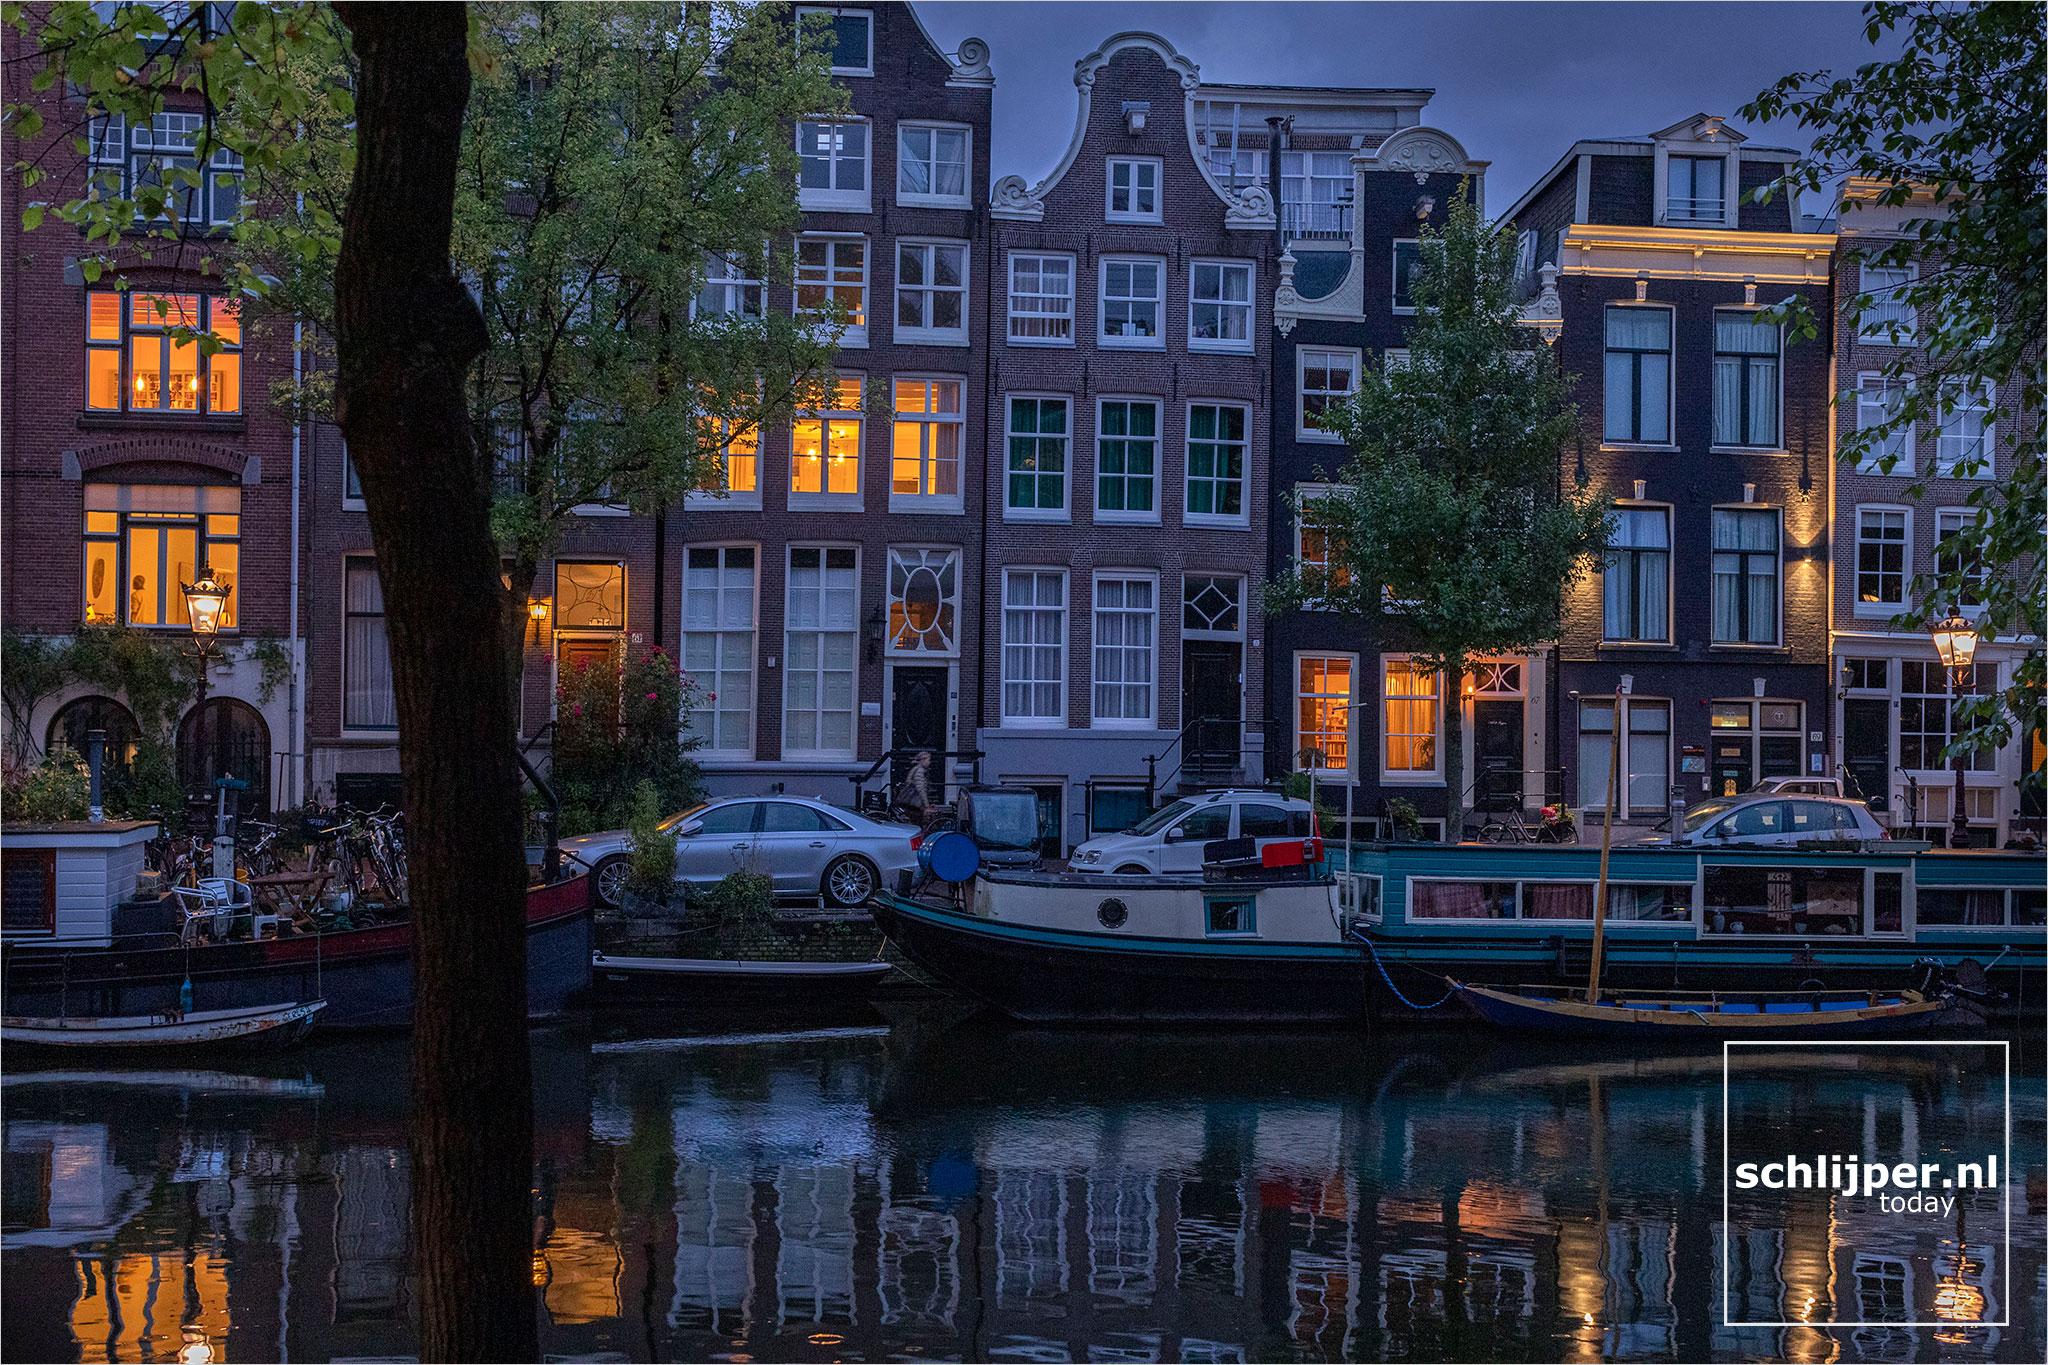 The Netherlands, Amsterdam, 12 oktober 2021